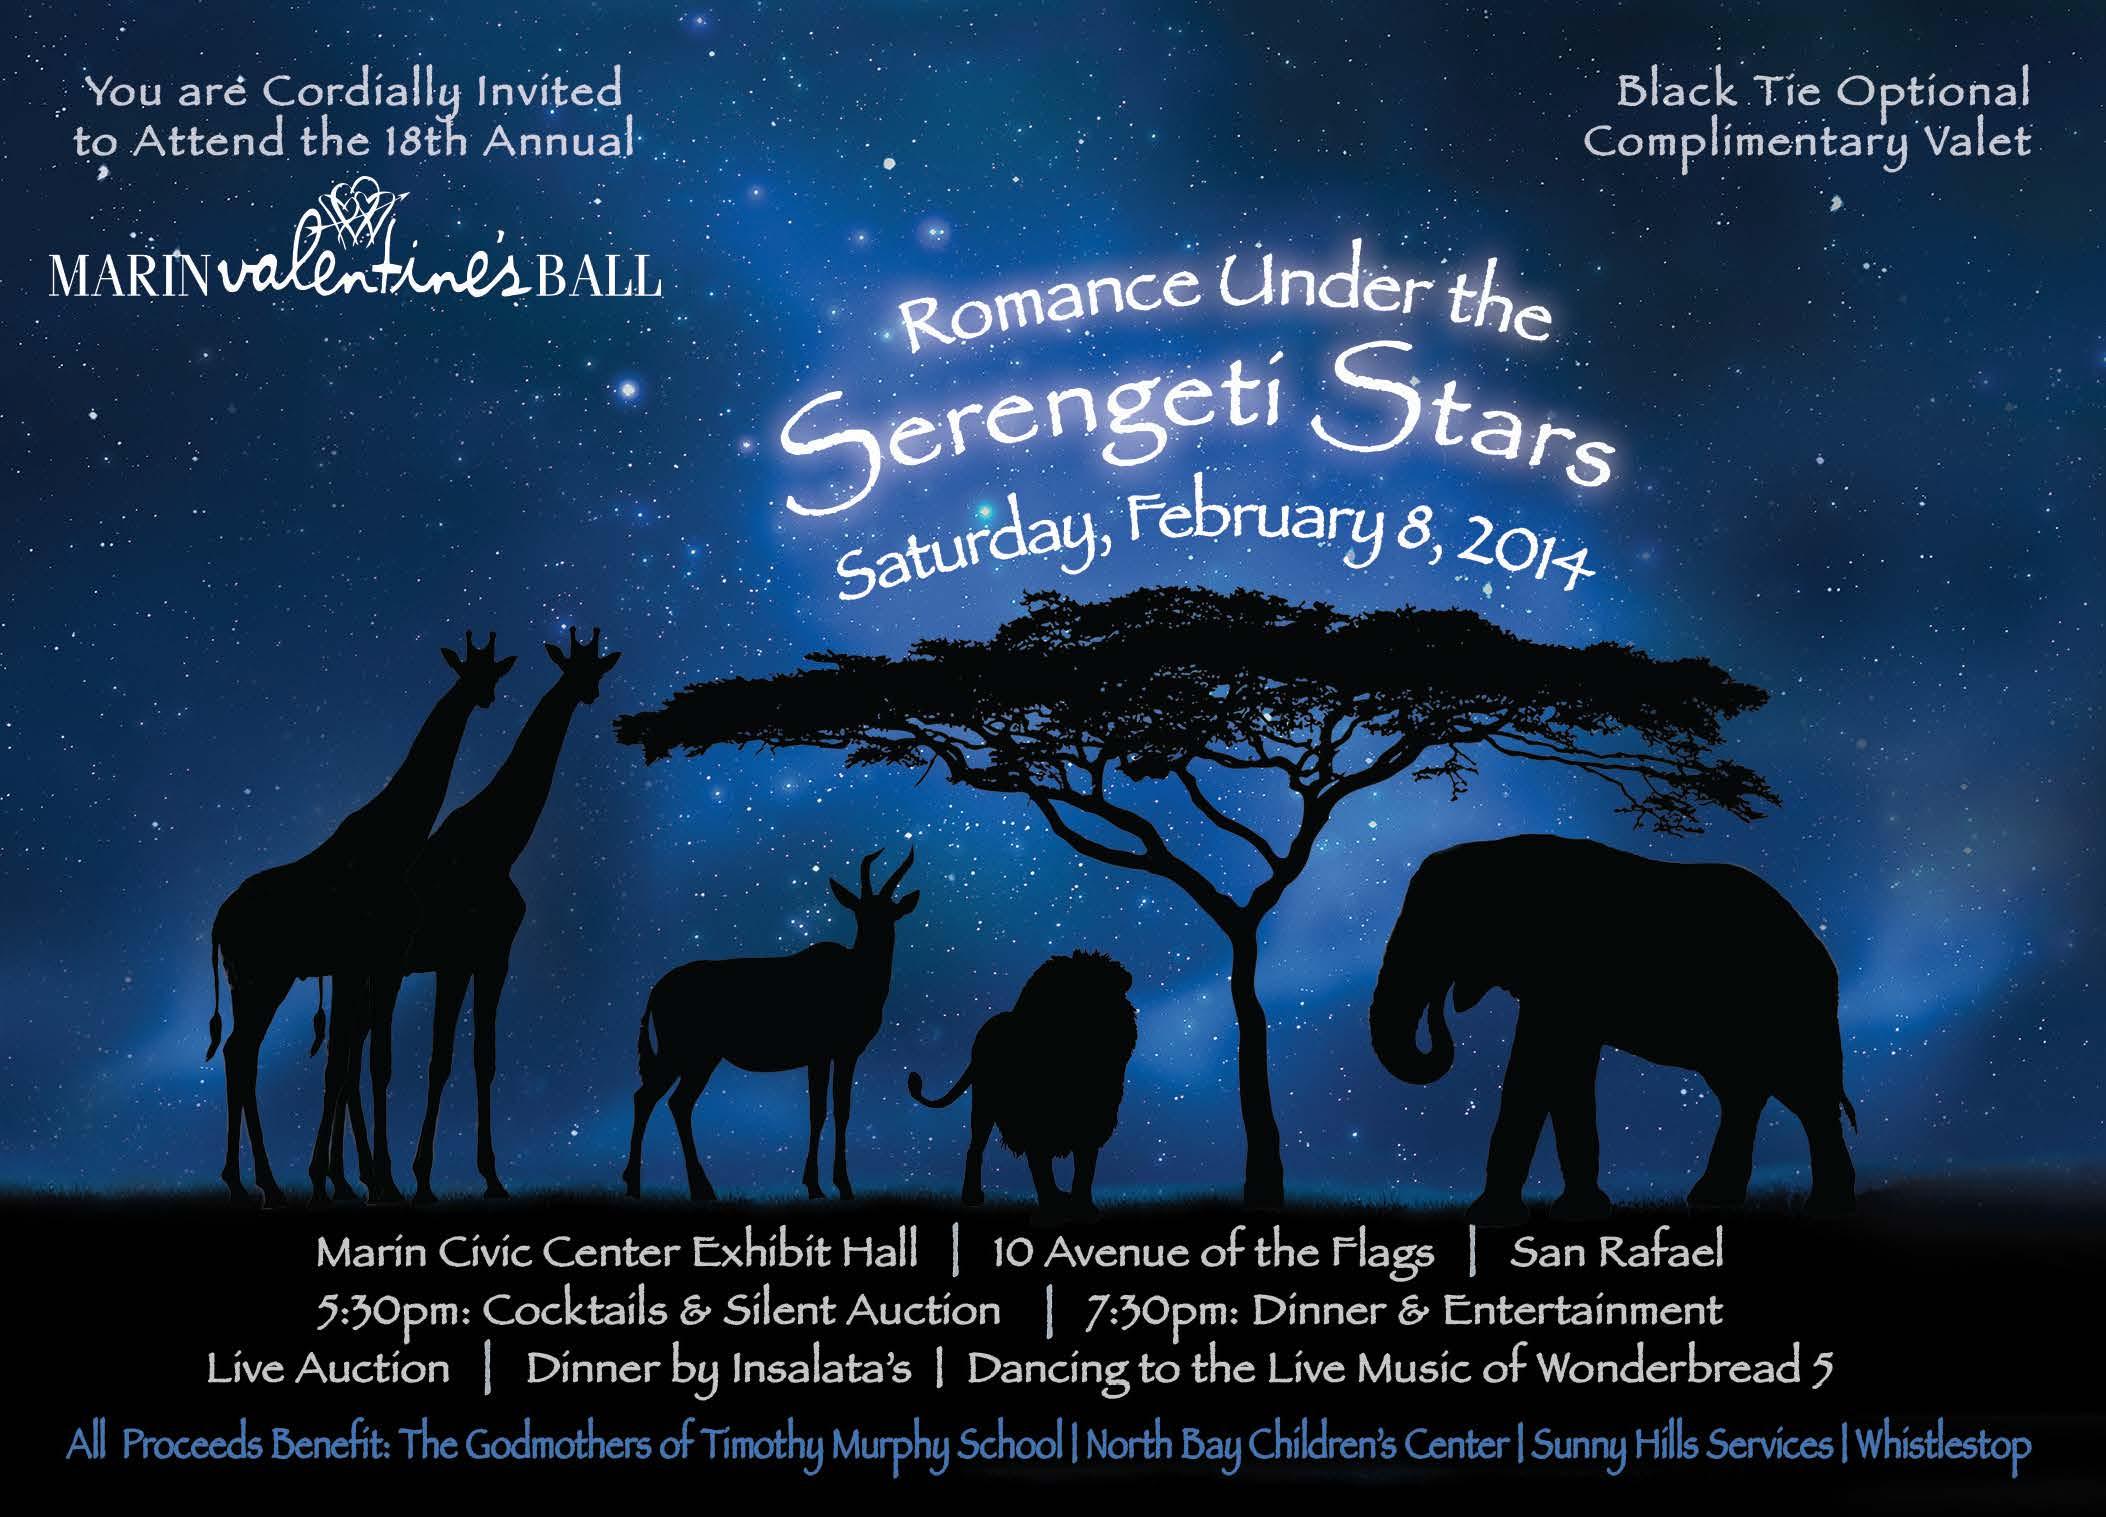 Marin Valentine's Ball Invitation